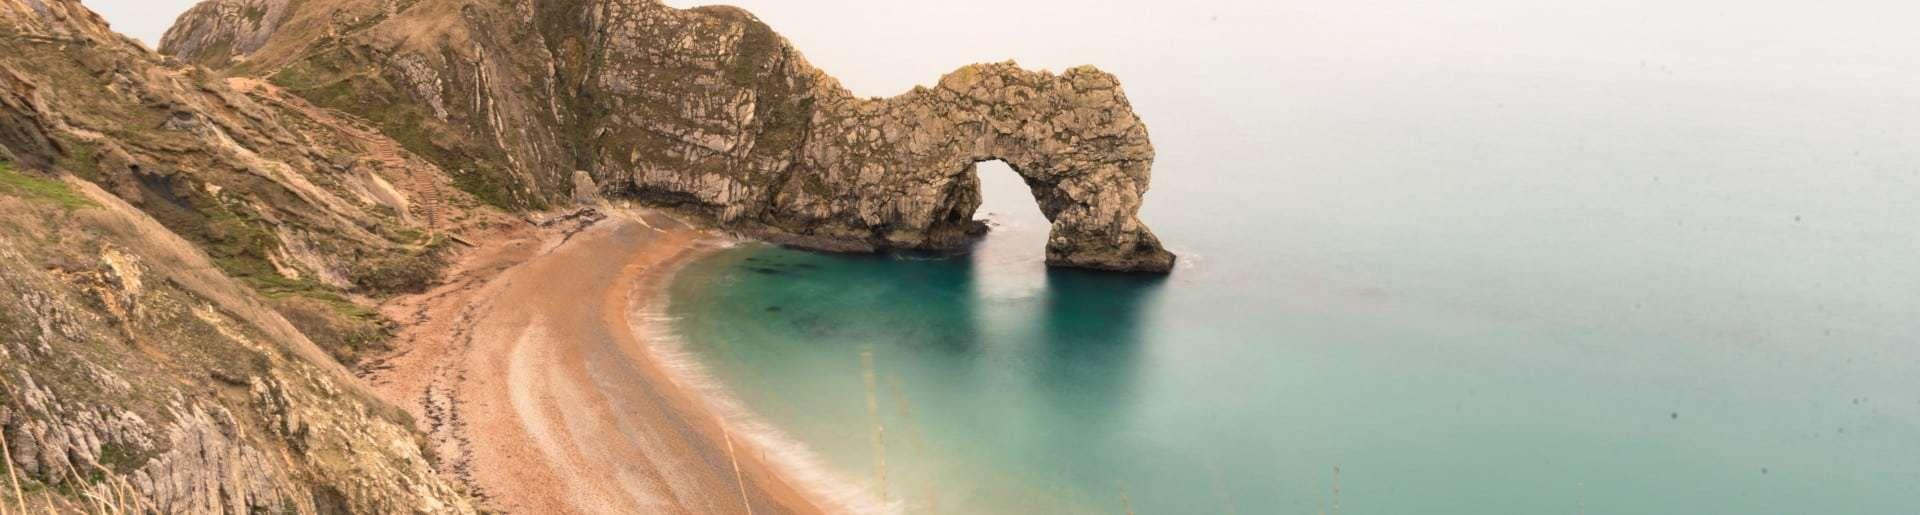 Escape the everyday in Dorset